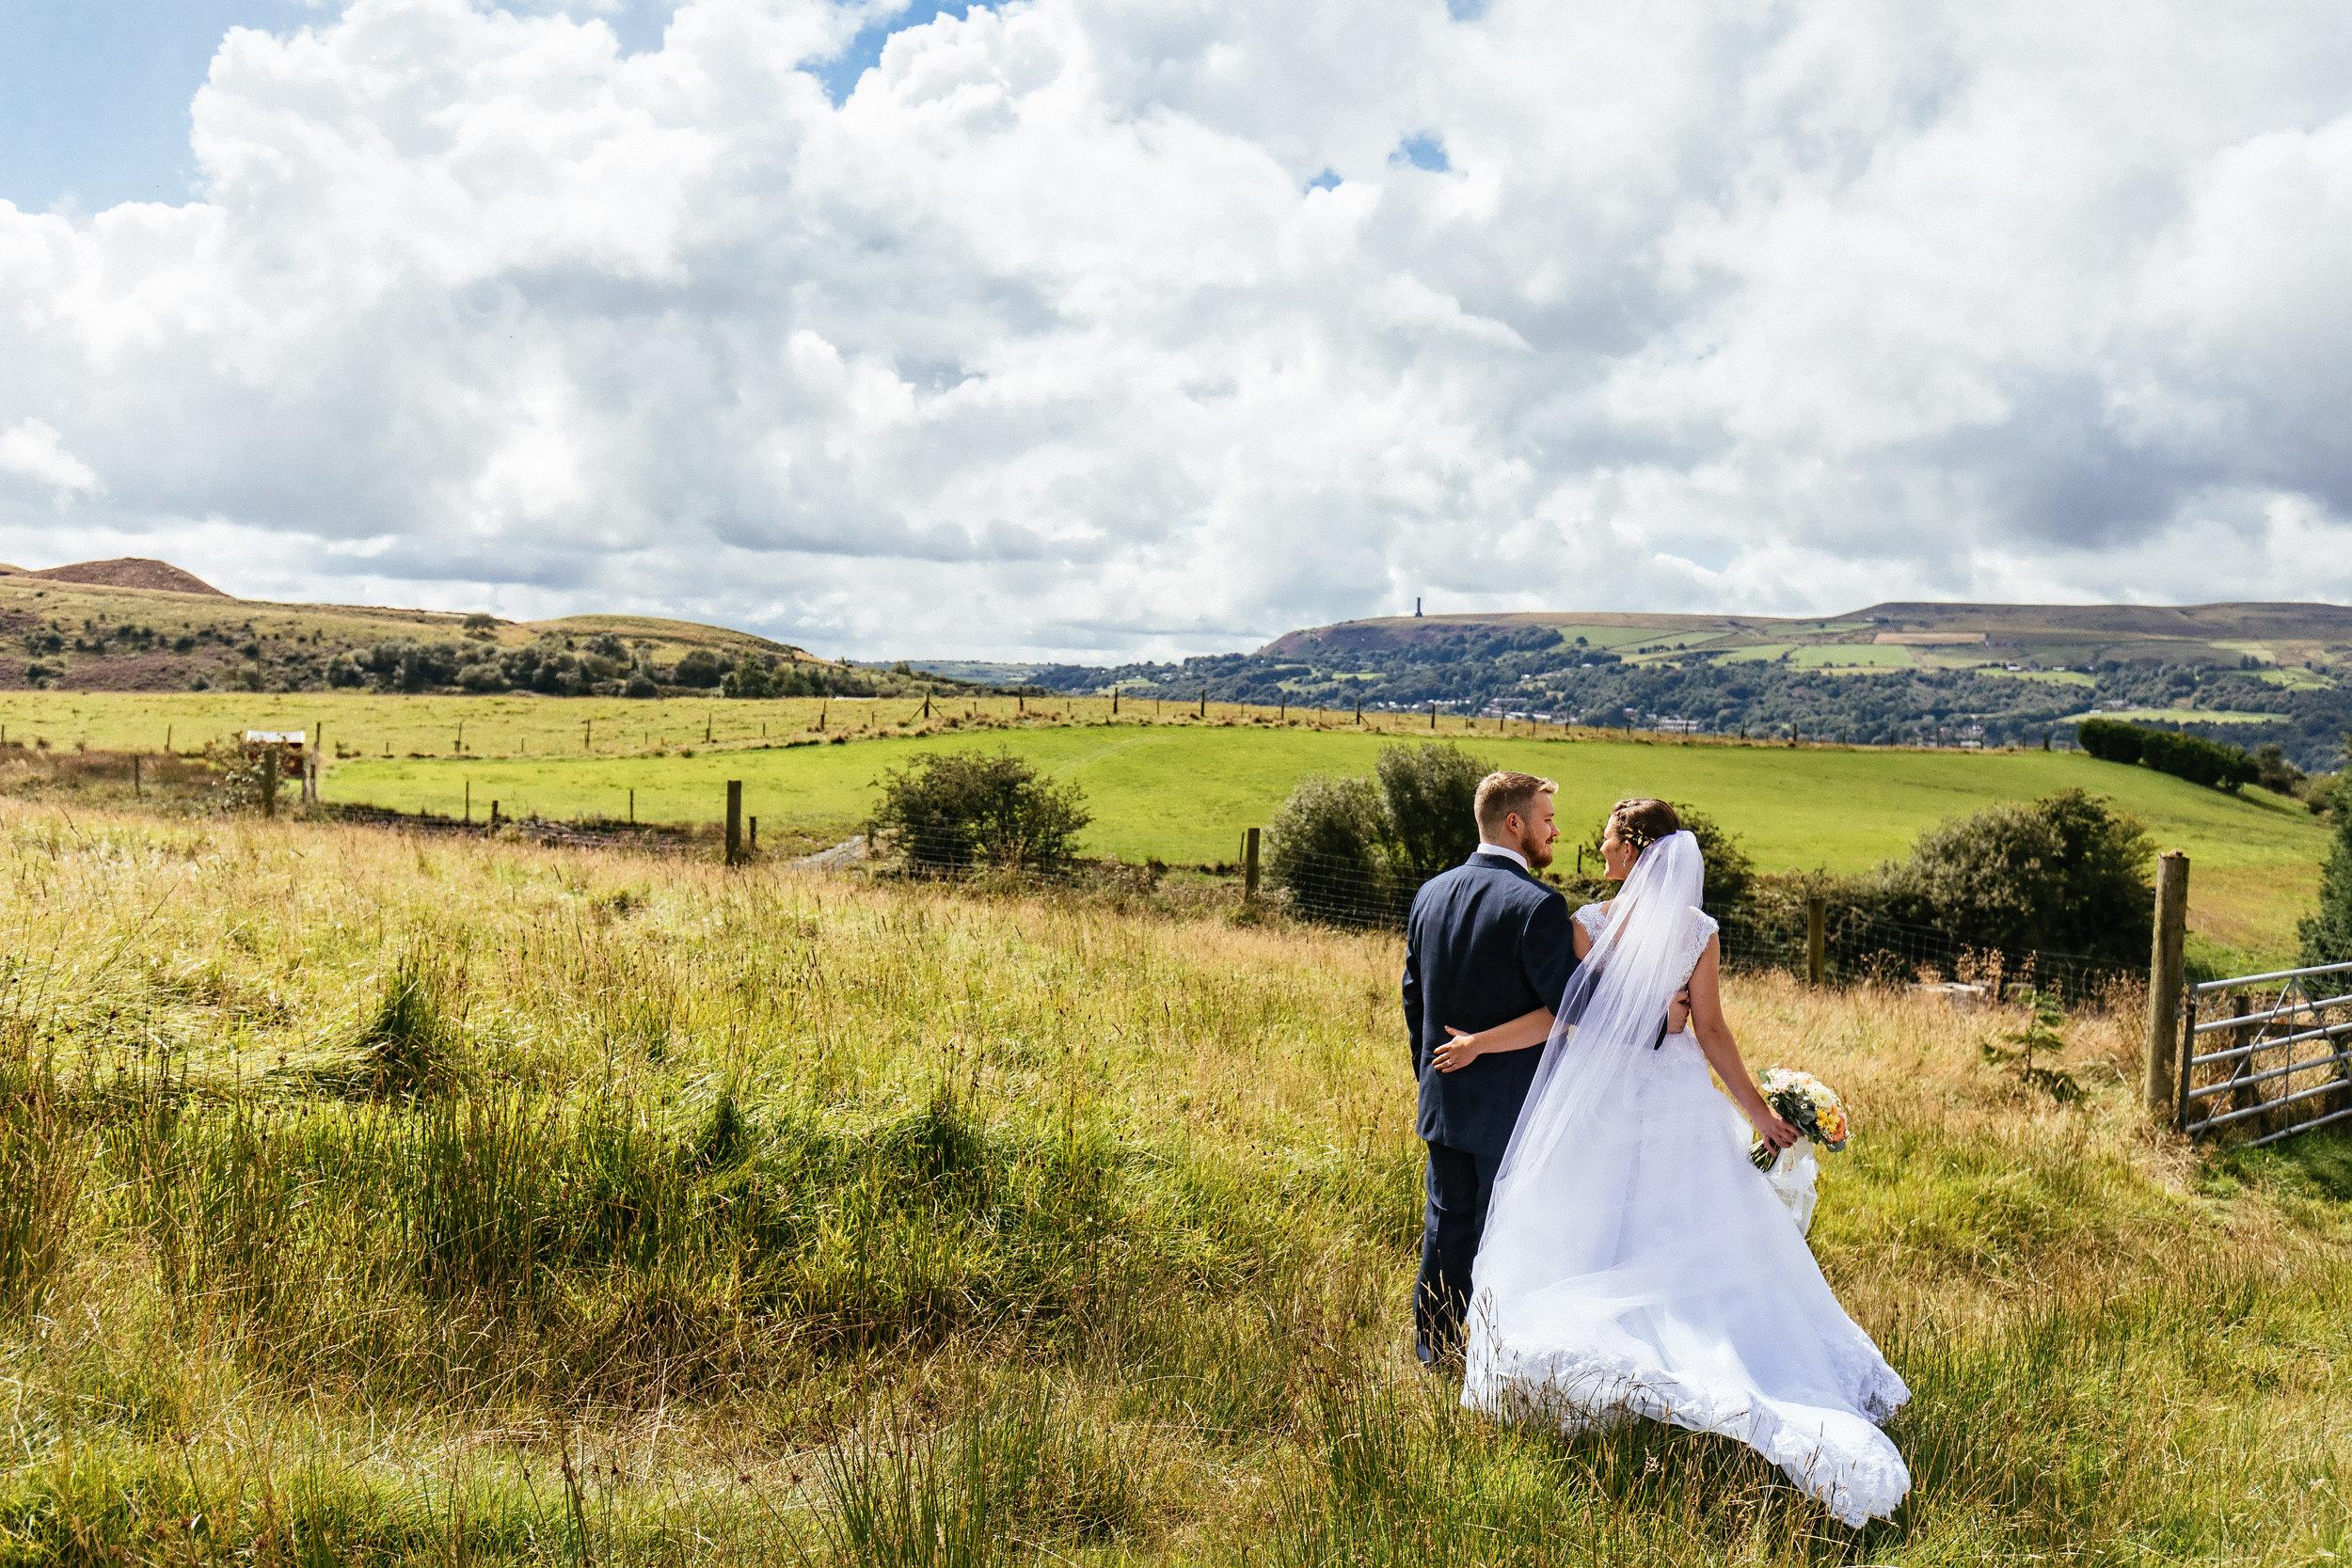 Kathryn-and-Mike-Wedding-Highlights-66.jpg